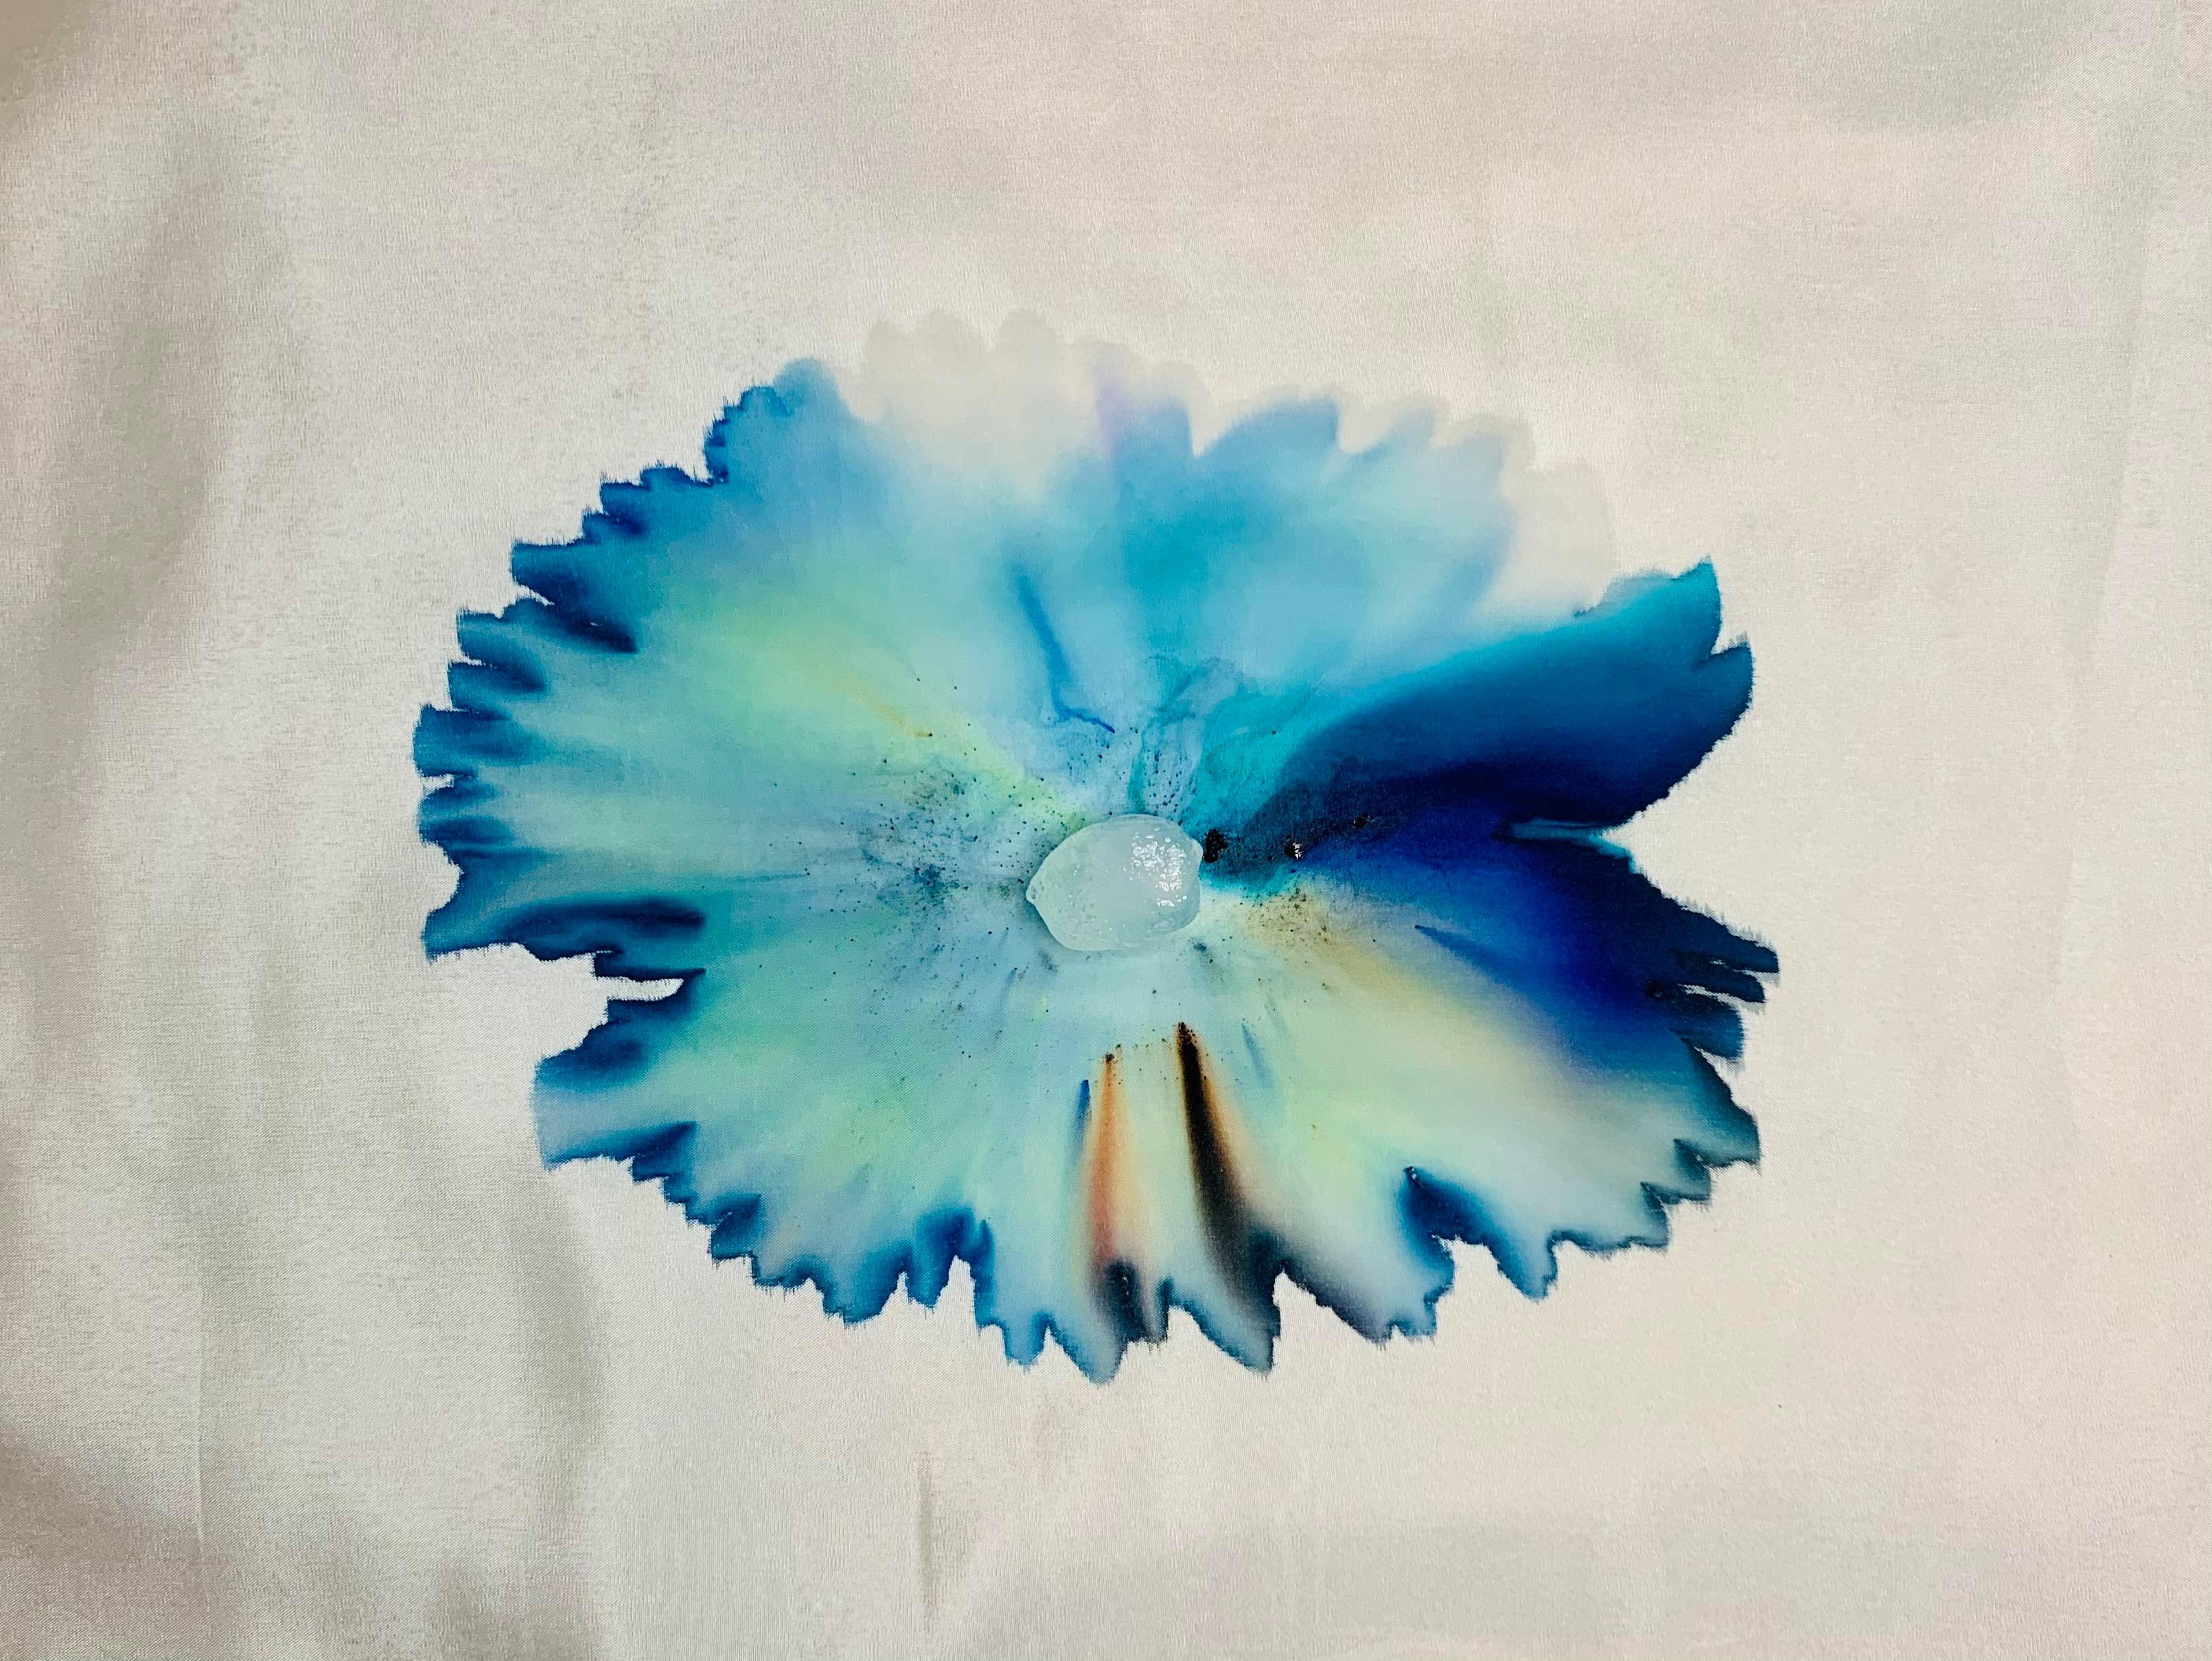 <p>1/30より氷染色家SAYAKA ASAIの作品「幻氷」が「有楽町 Wall Art Gallery」にて、展示開始</p>のイメージ画像